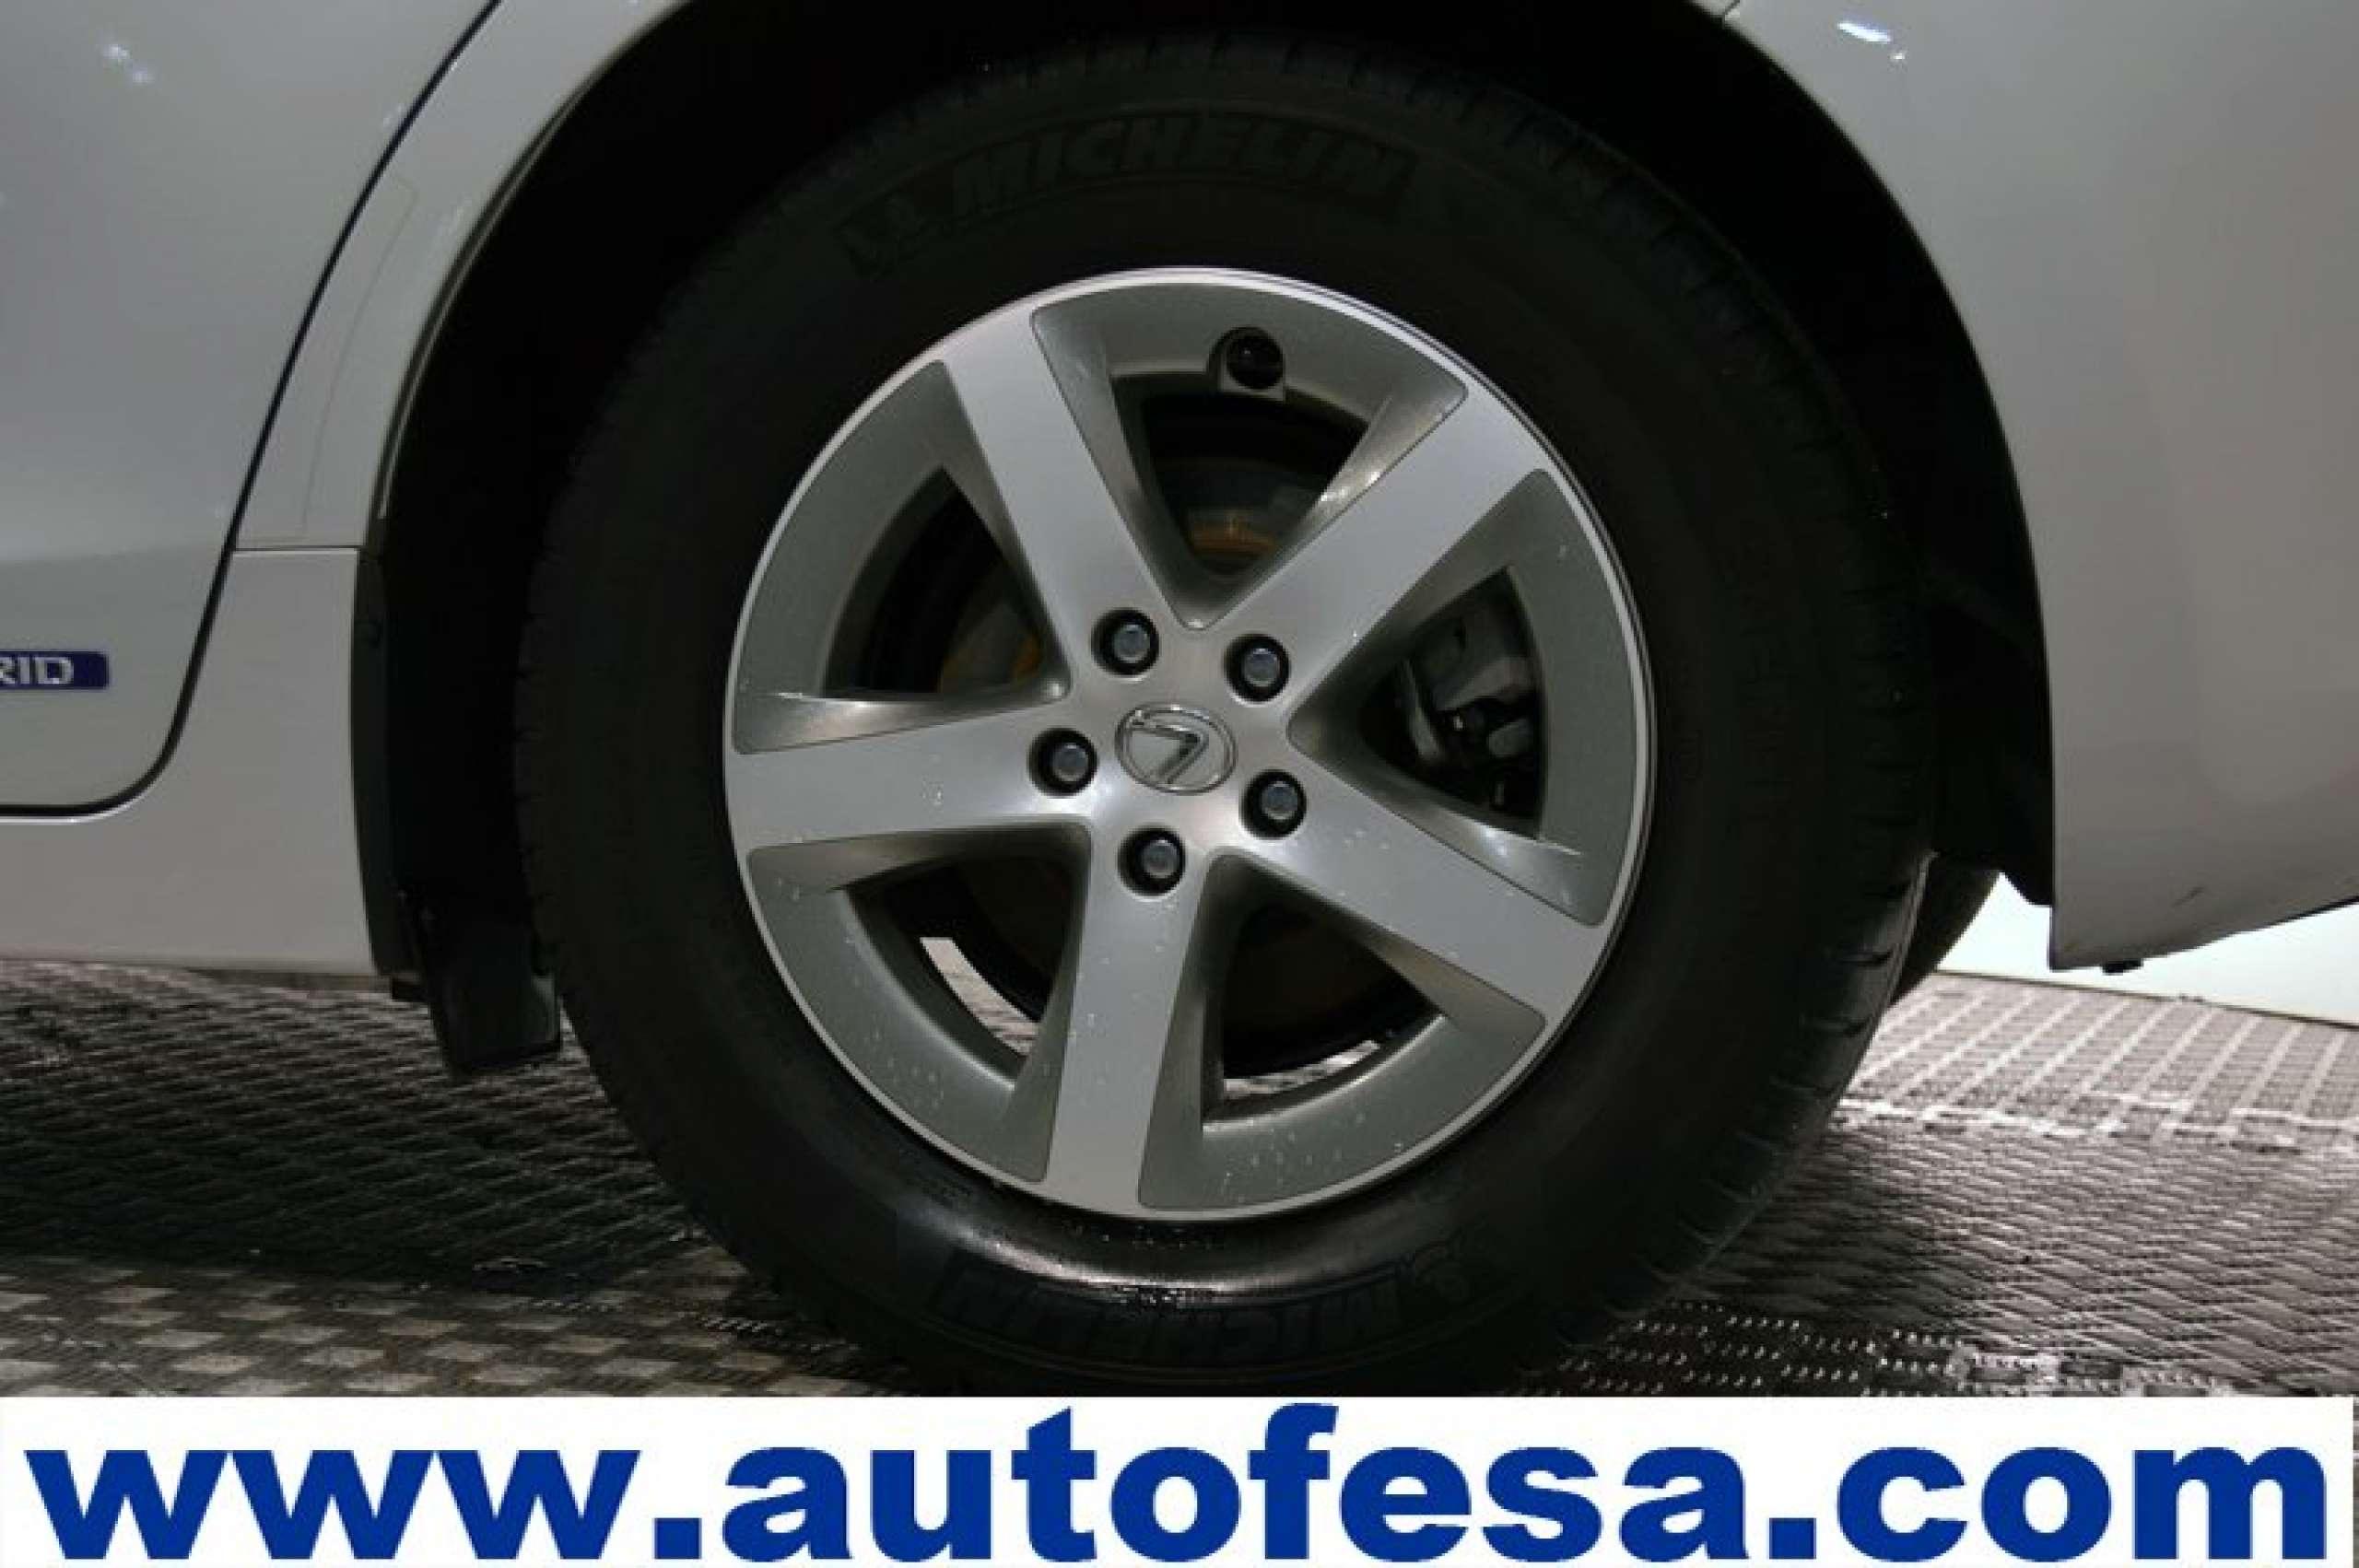 Lexus Ct 200h 1.8 136cv Eco Auto 5p - Foto 35